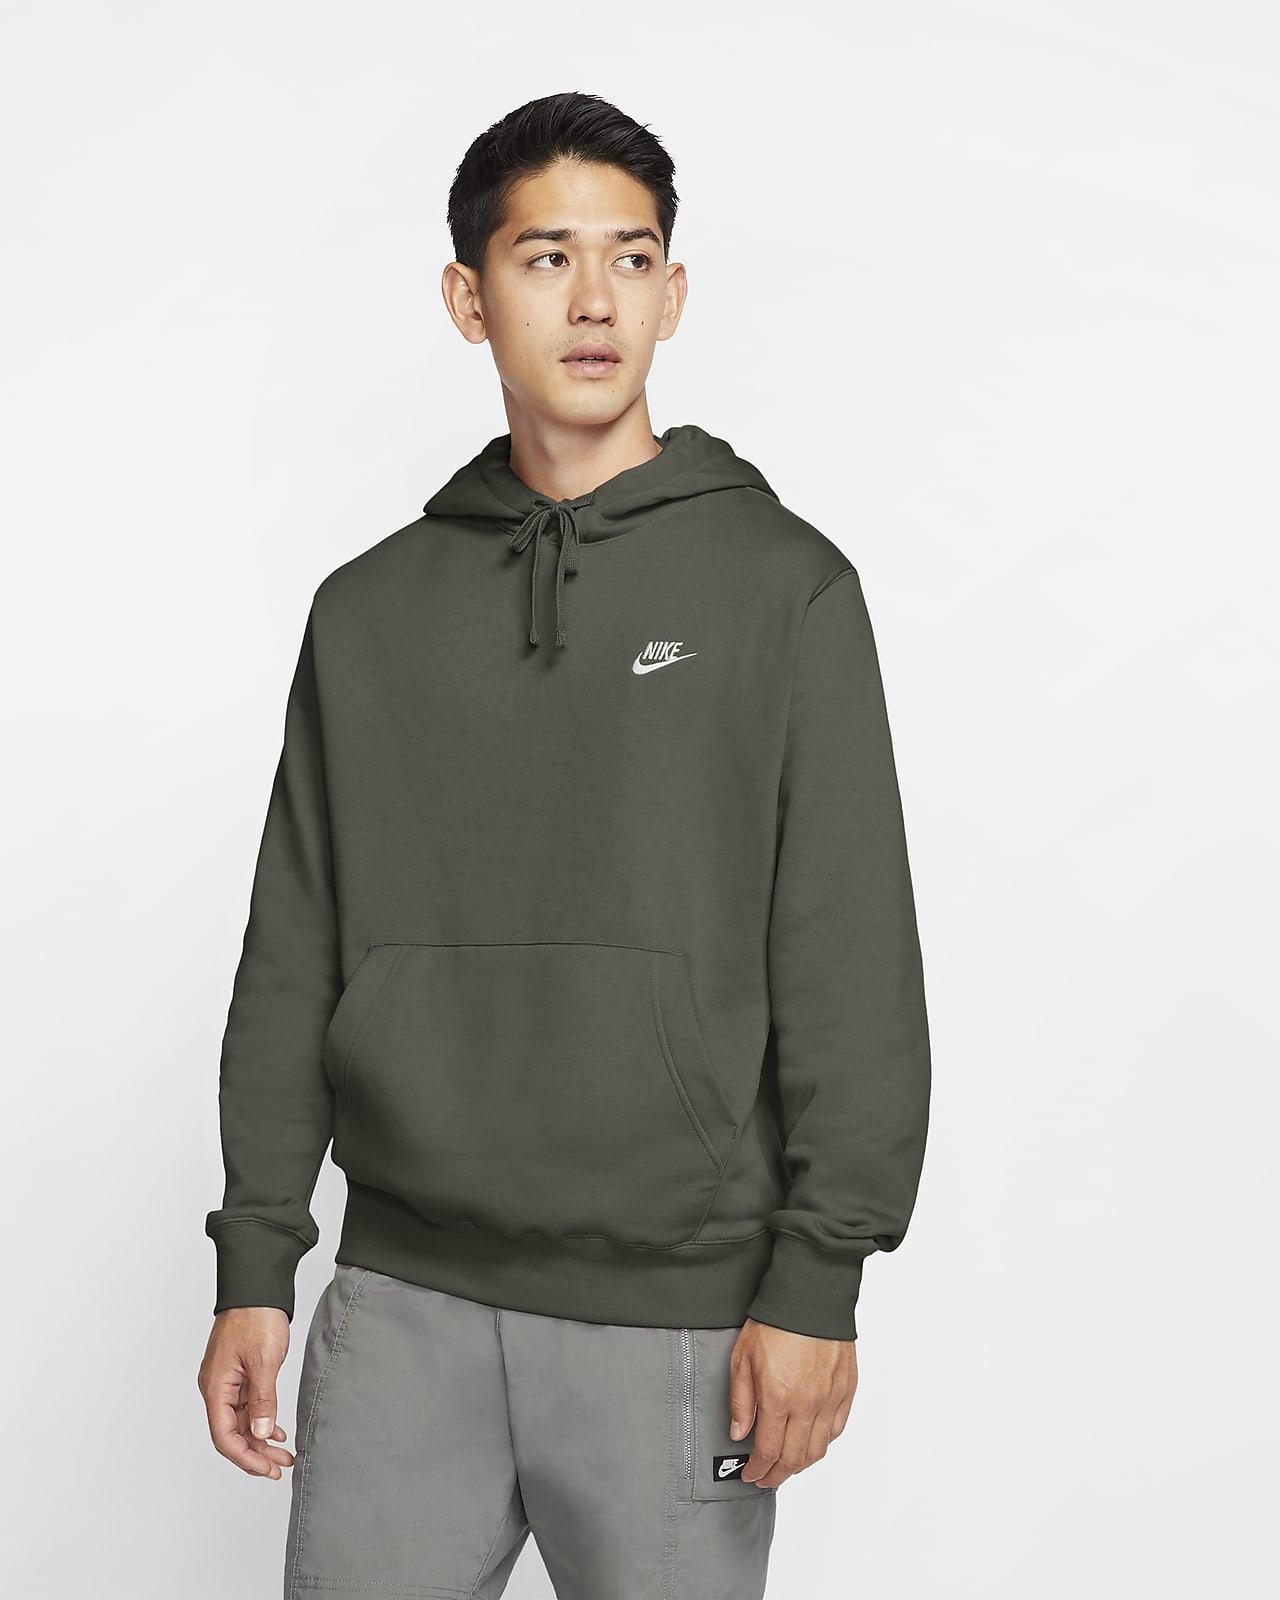 Nike Sportswear Club Herren Sweatshirt | KELLER X [AT]